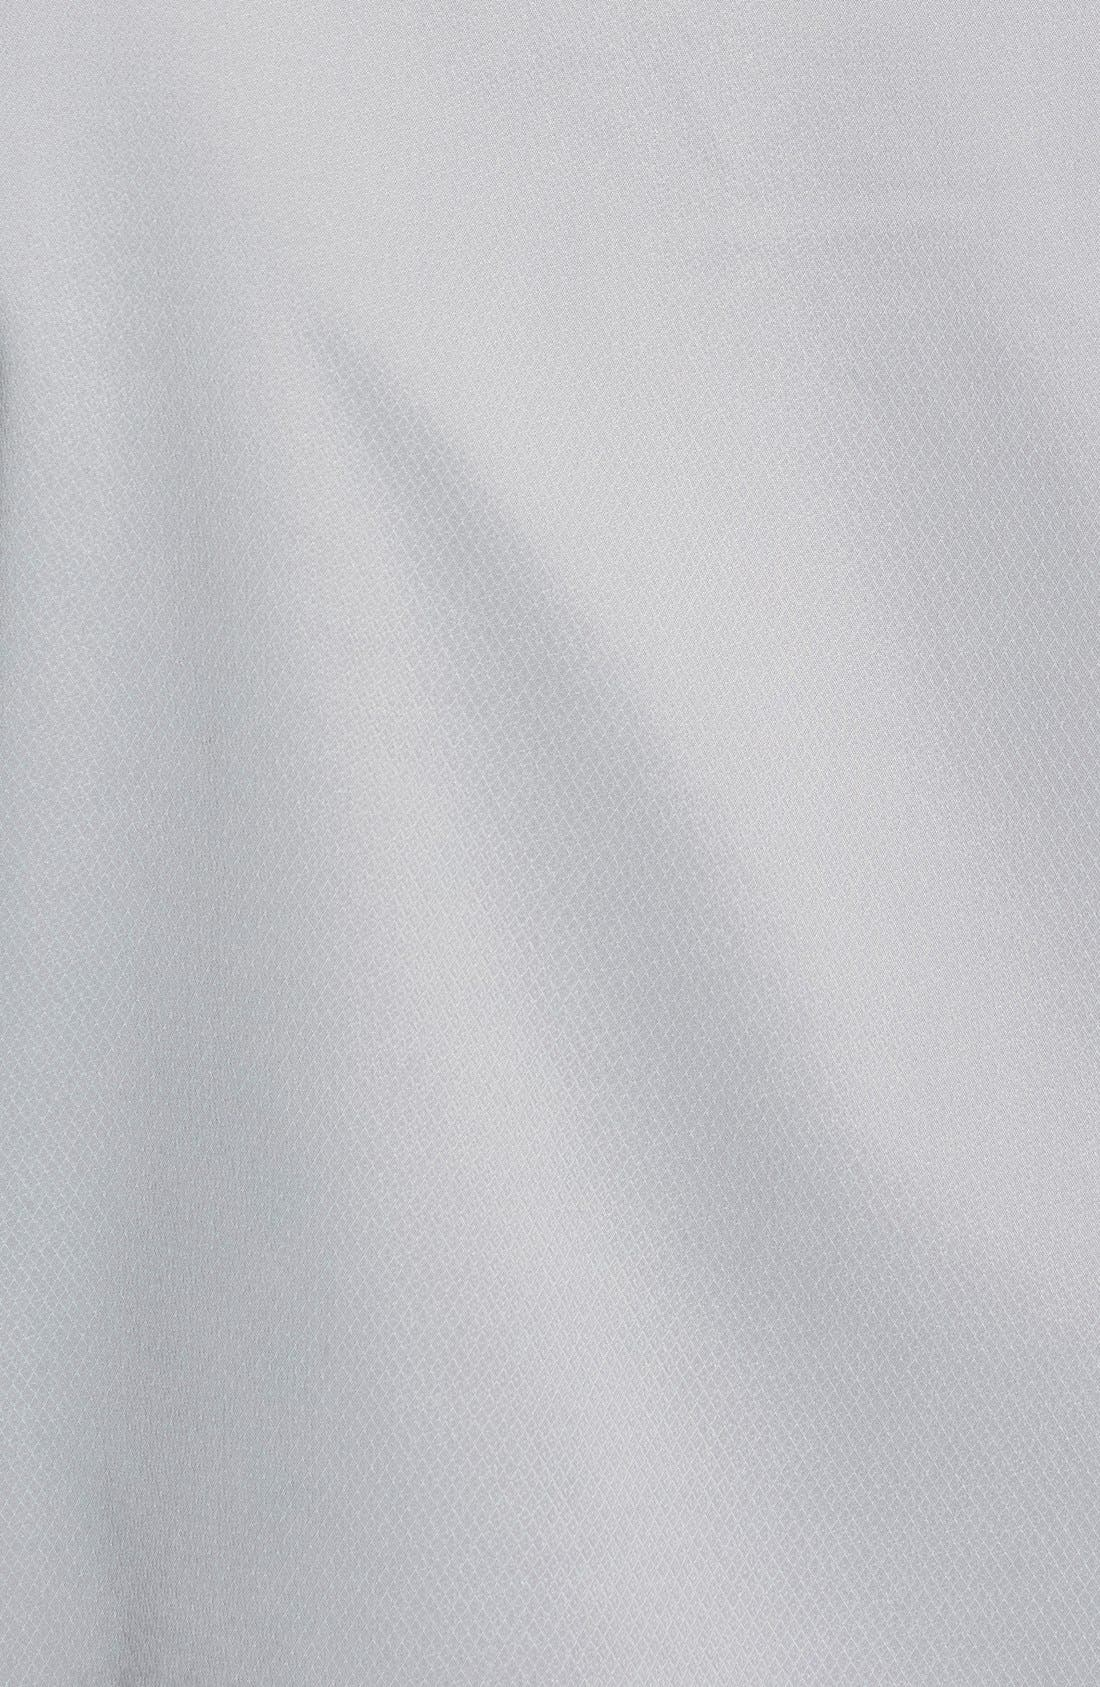 CUTTER & BUCK, Blakely WeatherTec<sup>®</sup> Wind & Water Resistant Full Zip Jacket, Alternate thumbnail 3, color, OXIDE GREY